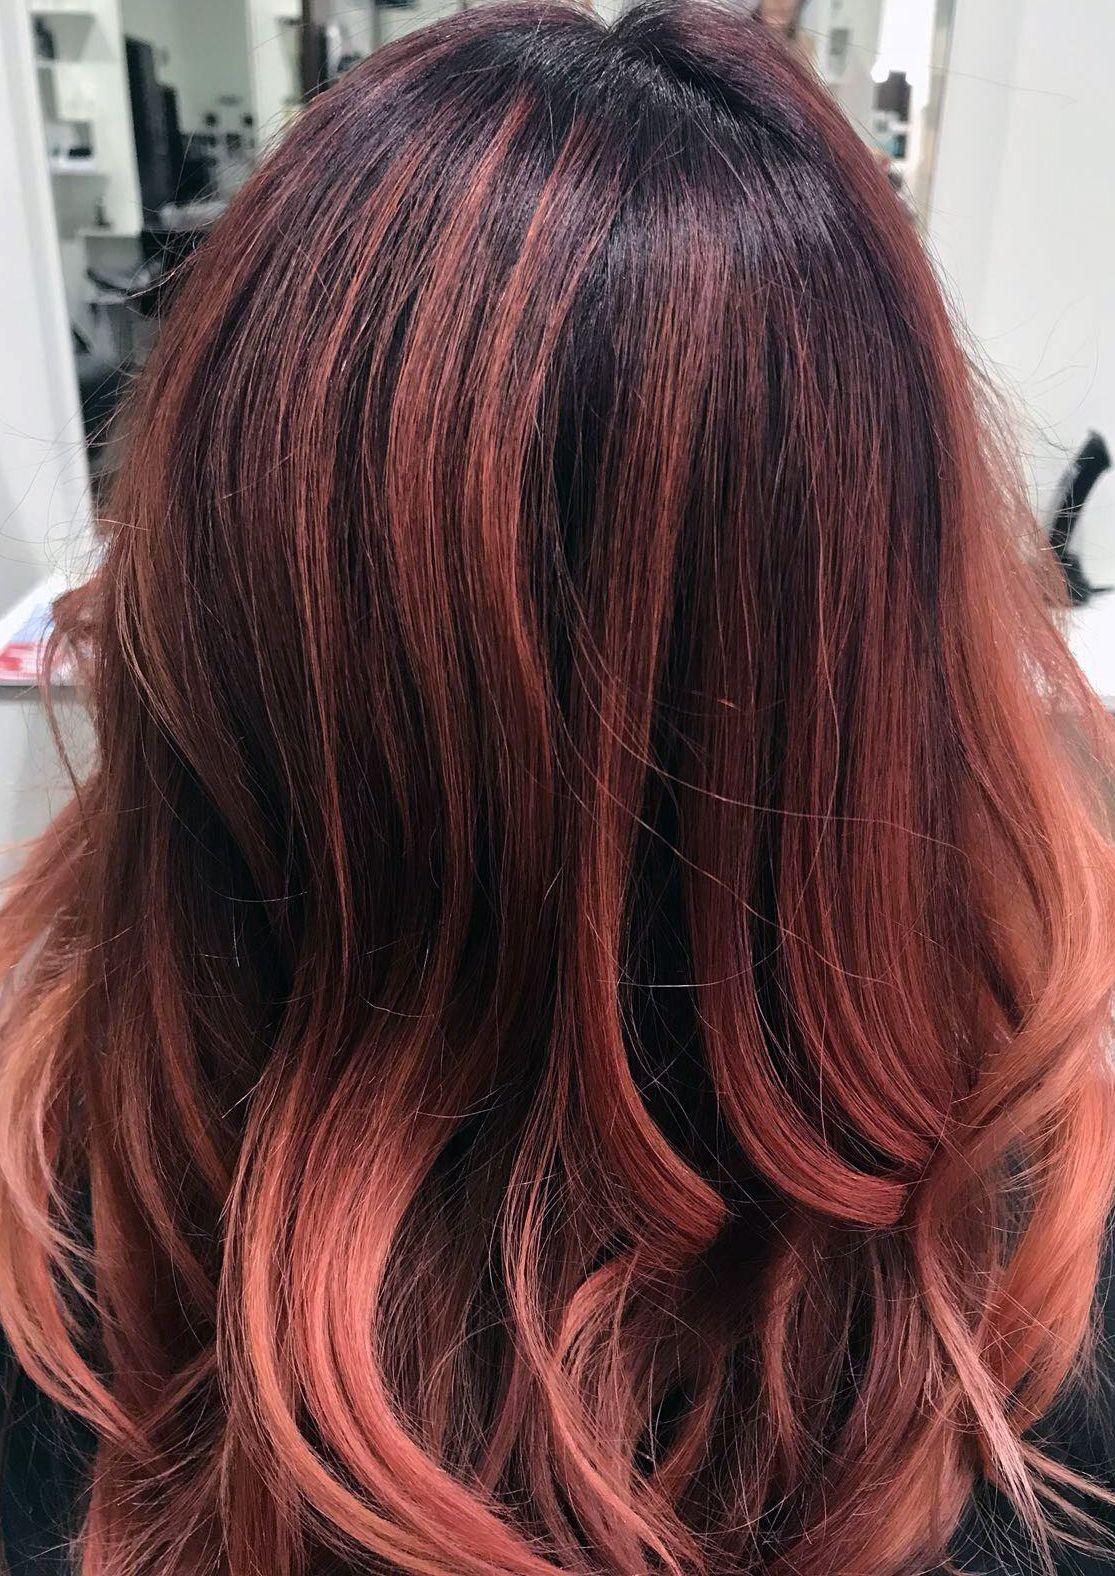 Haarfarben Trends 2019 Kreative Balayage D Machts Lounge Alexa